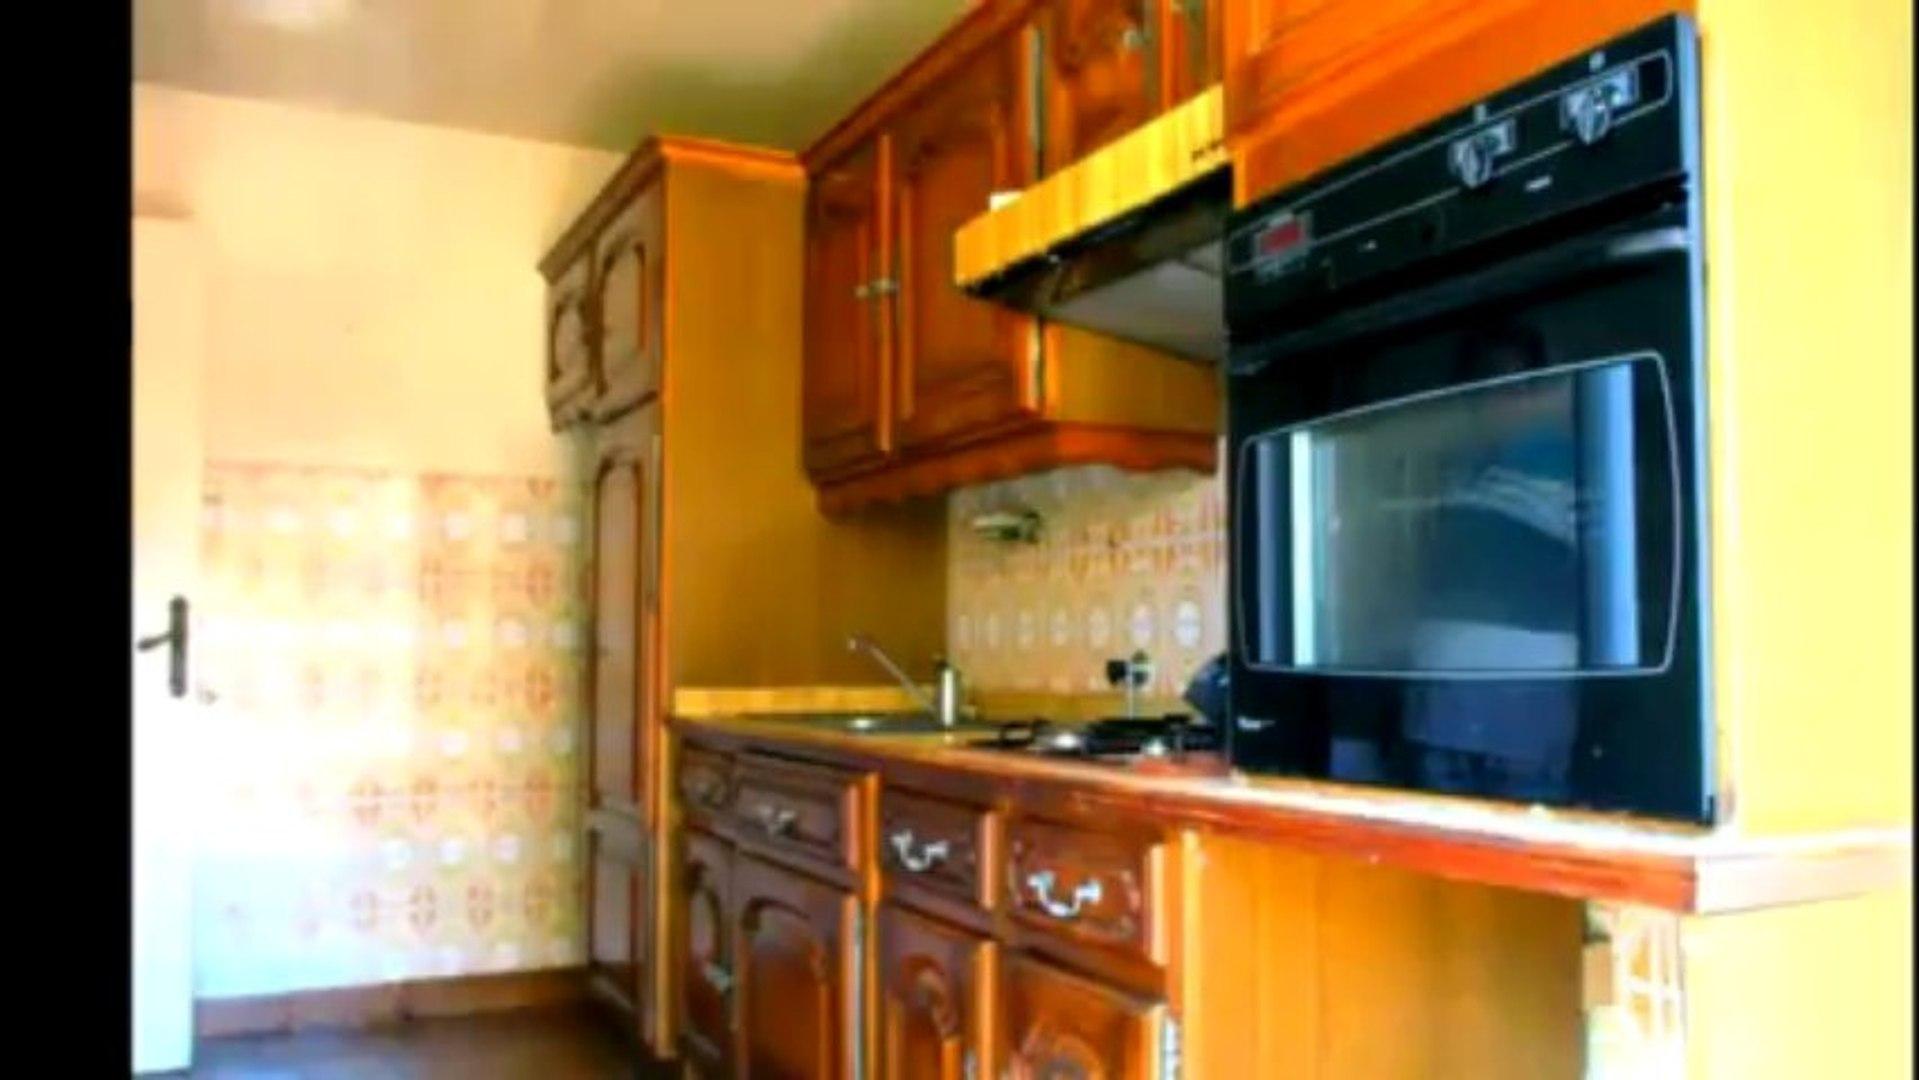 Vente - Appartement Nice (Saint Roch) - 229 000 €